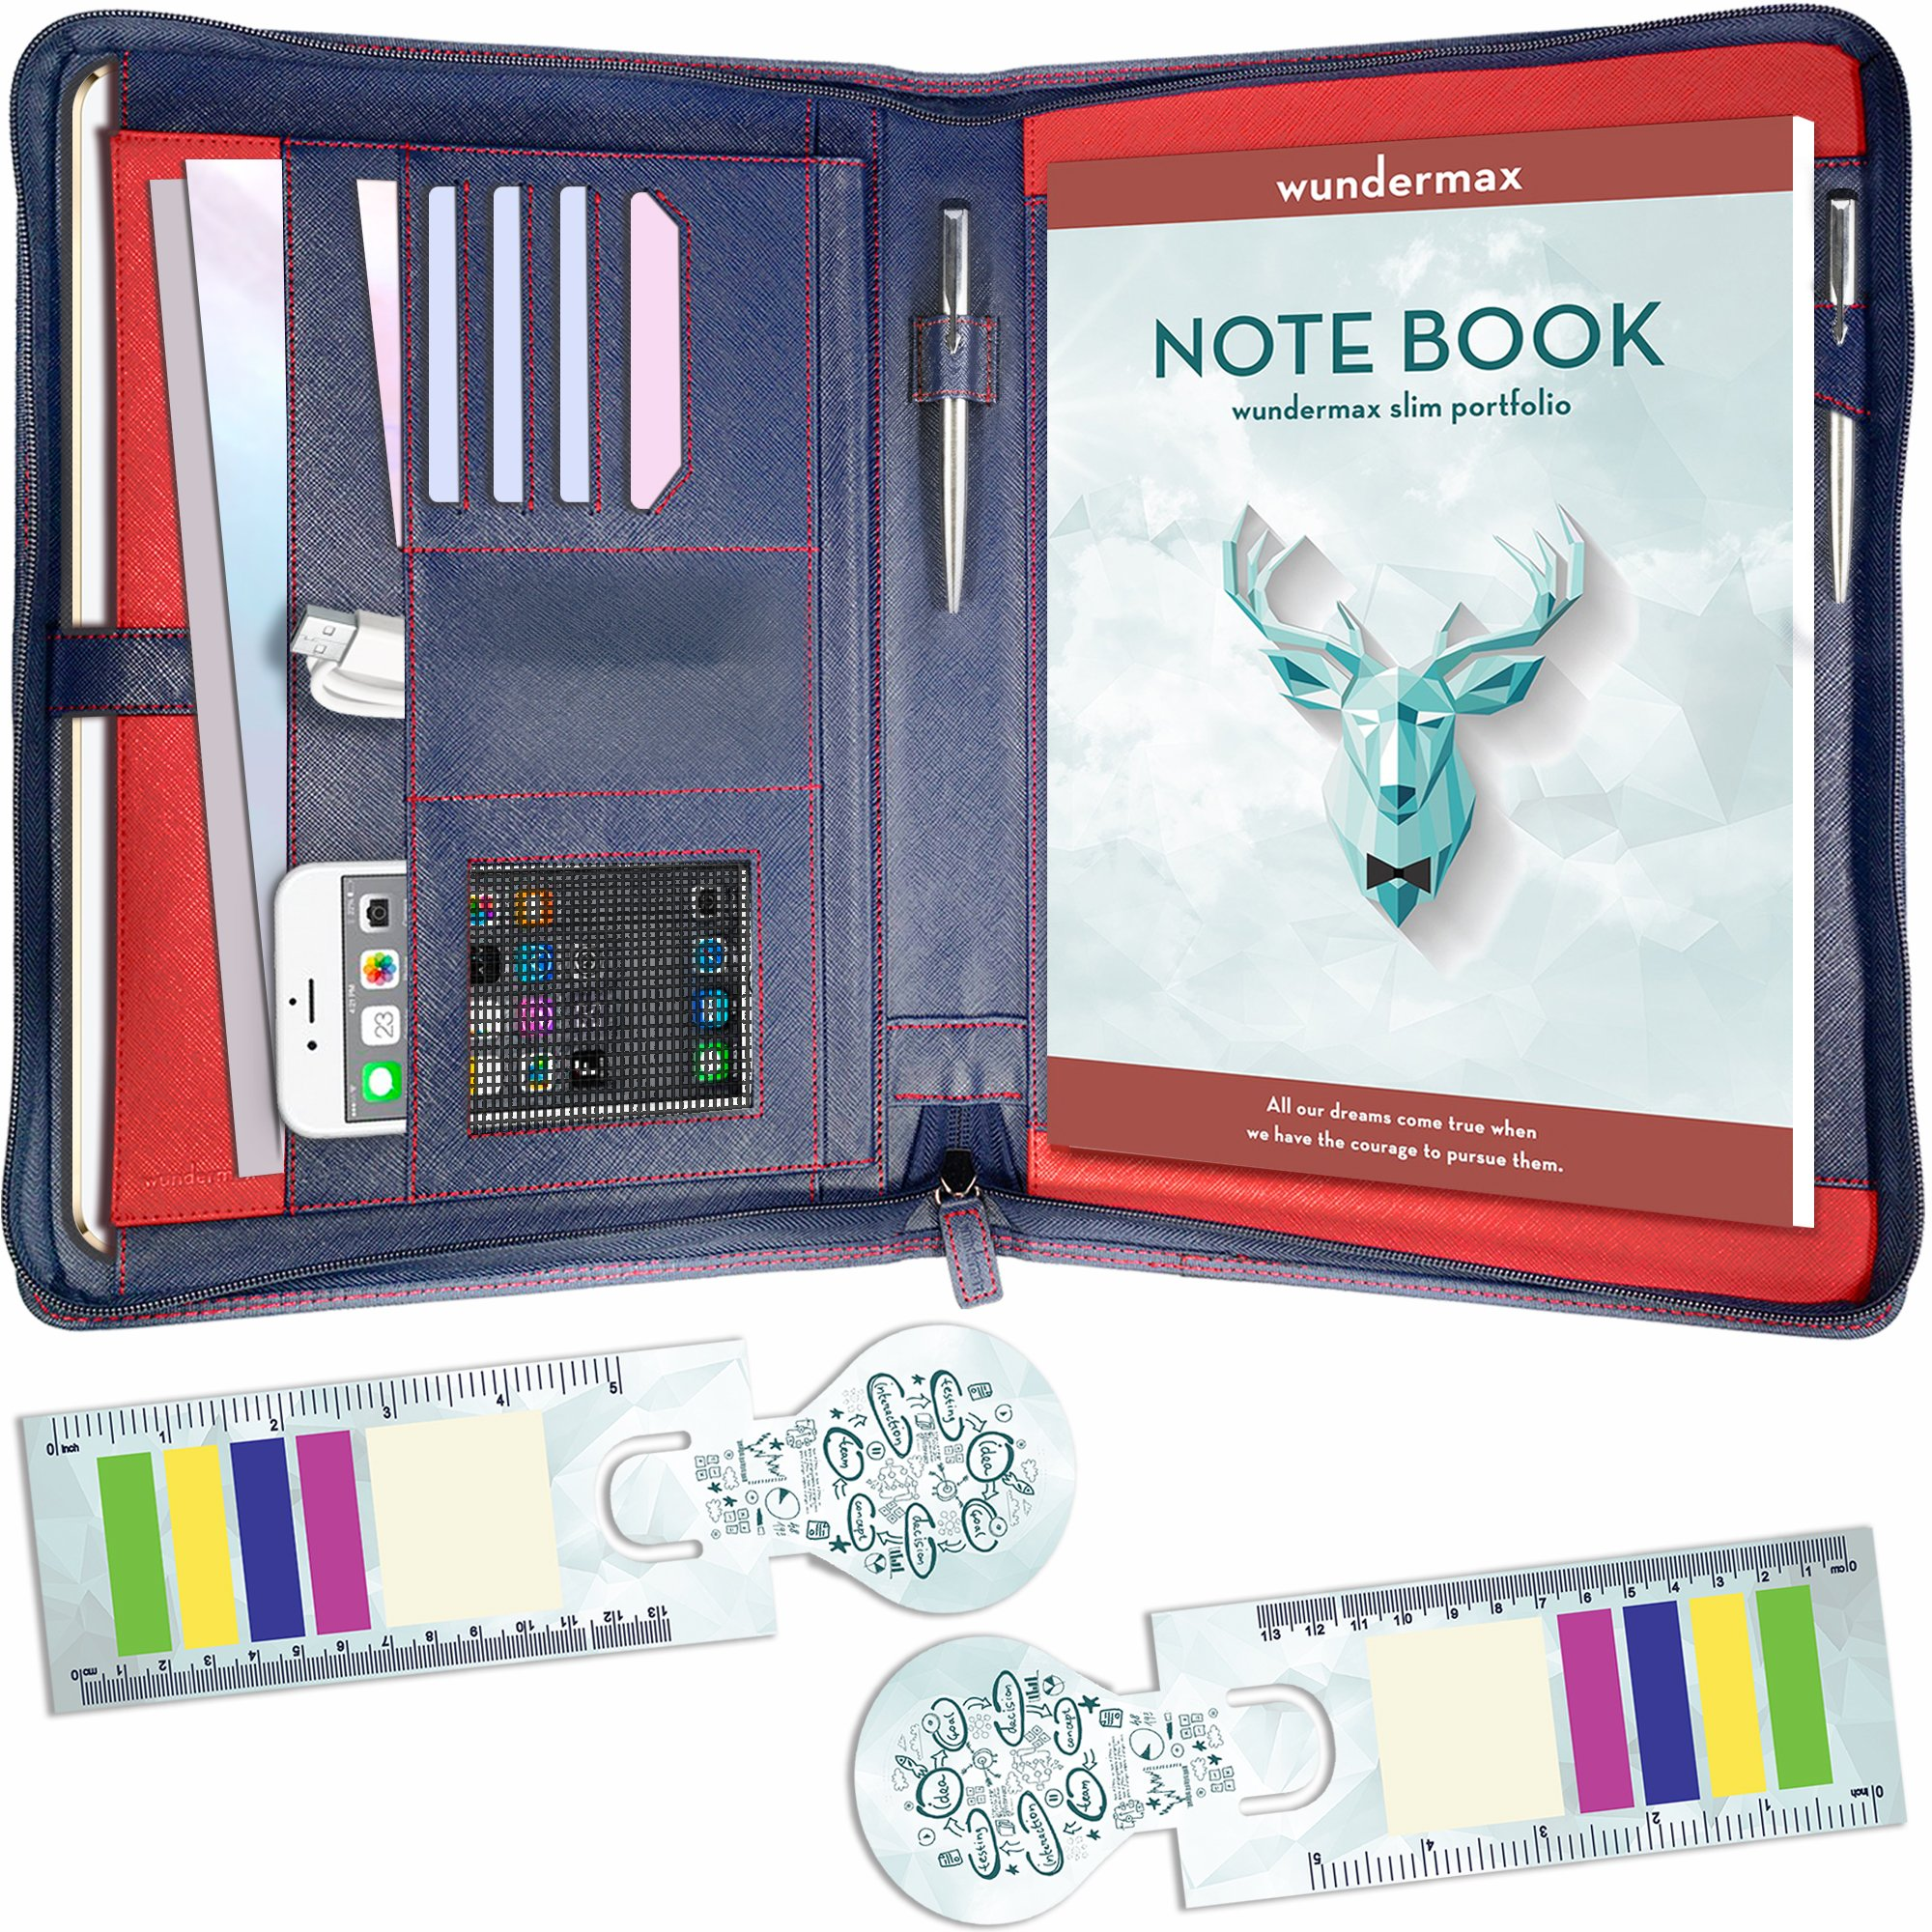 Wundermax Portfolio Padfolio/Leather Portfolio Zippered Closure - Bonus Bookmarks & Writing Pad - Tablet Sleeve - Professional Business Gift (Blue)